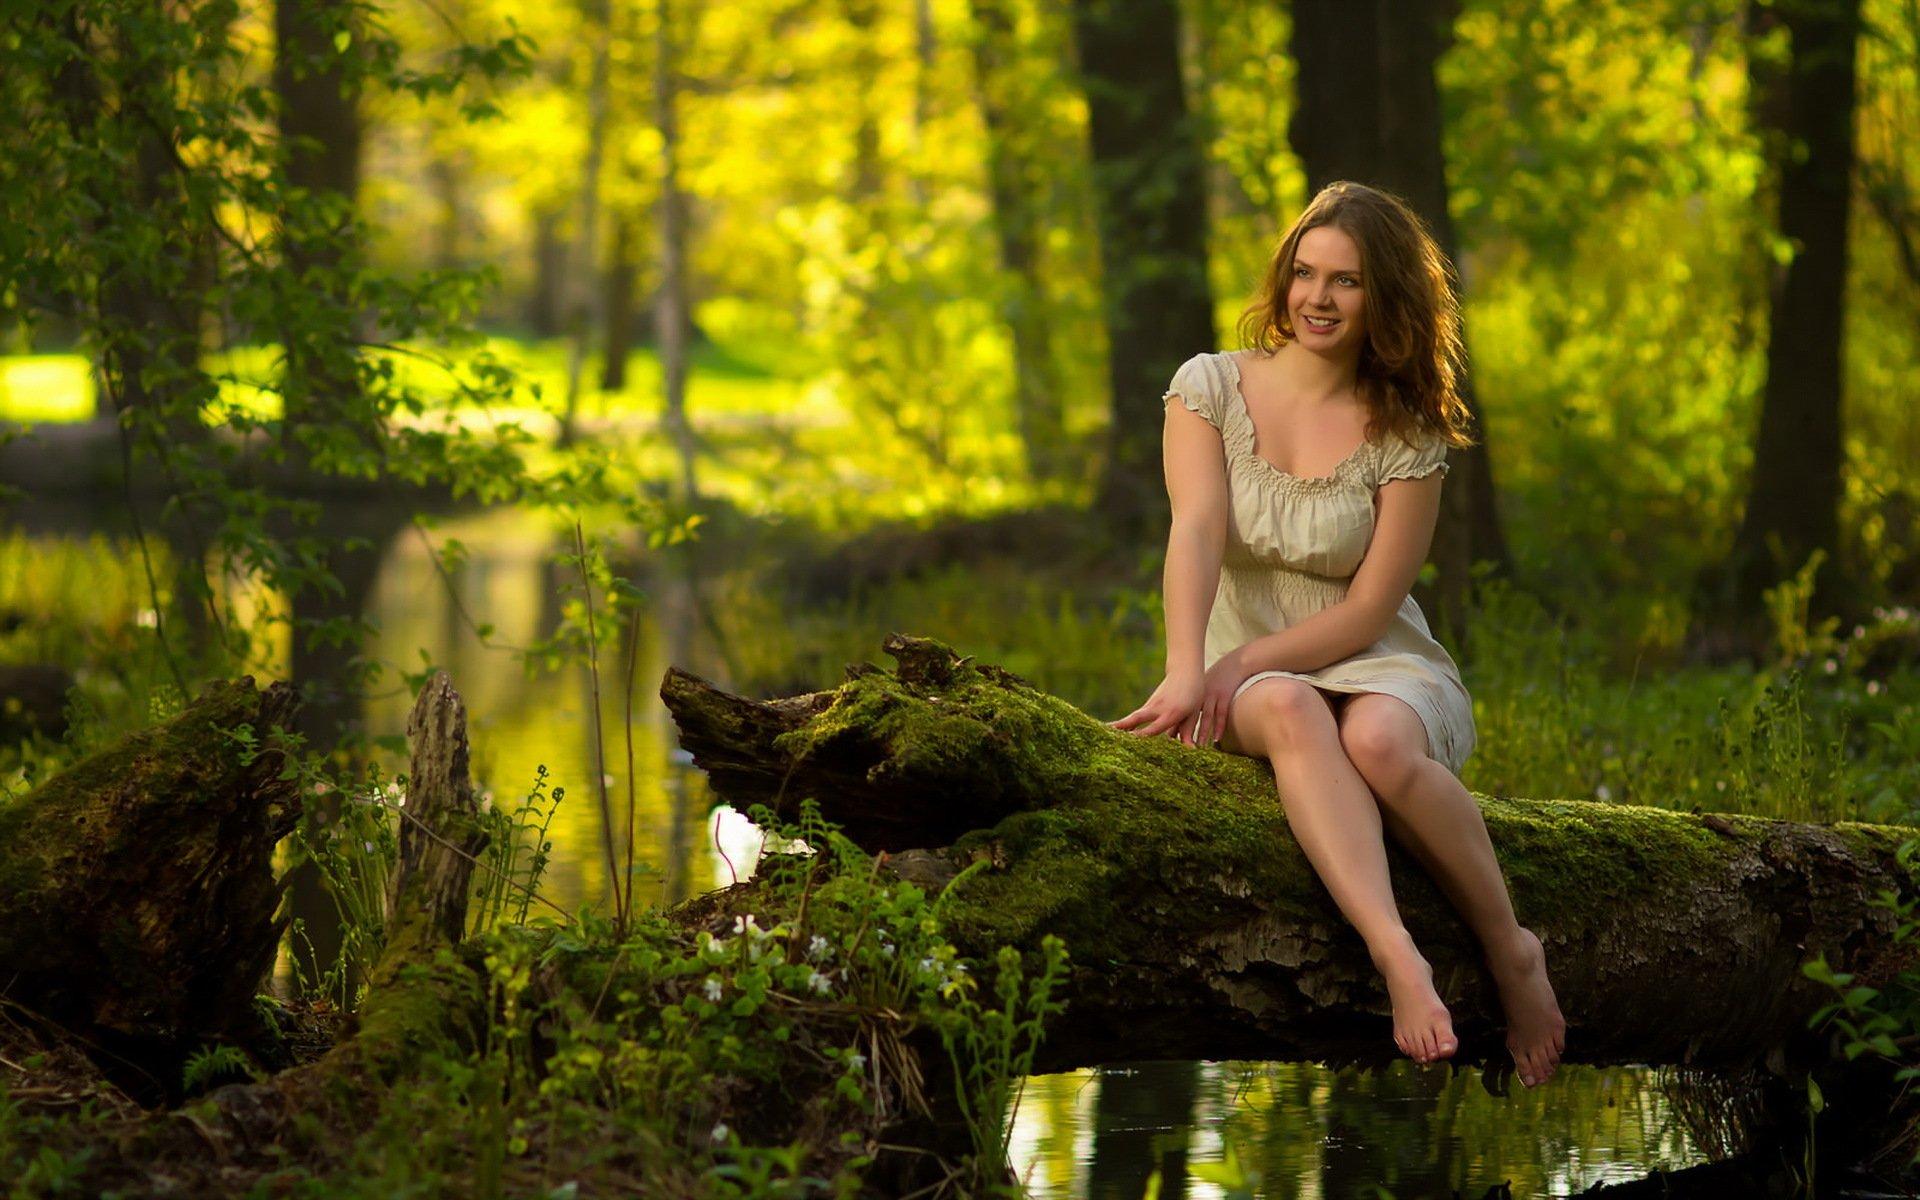 Девушка дерево улыбка лес Girl tree smile forest скачать